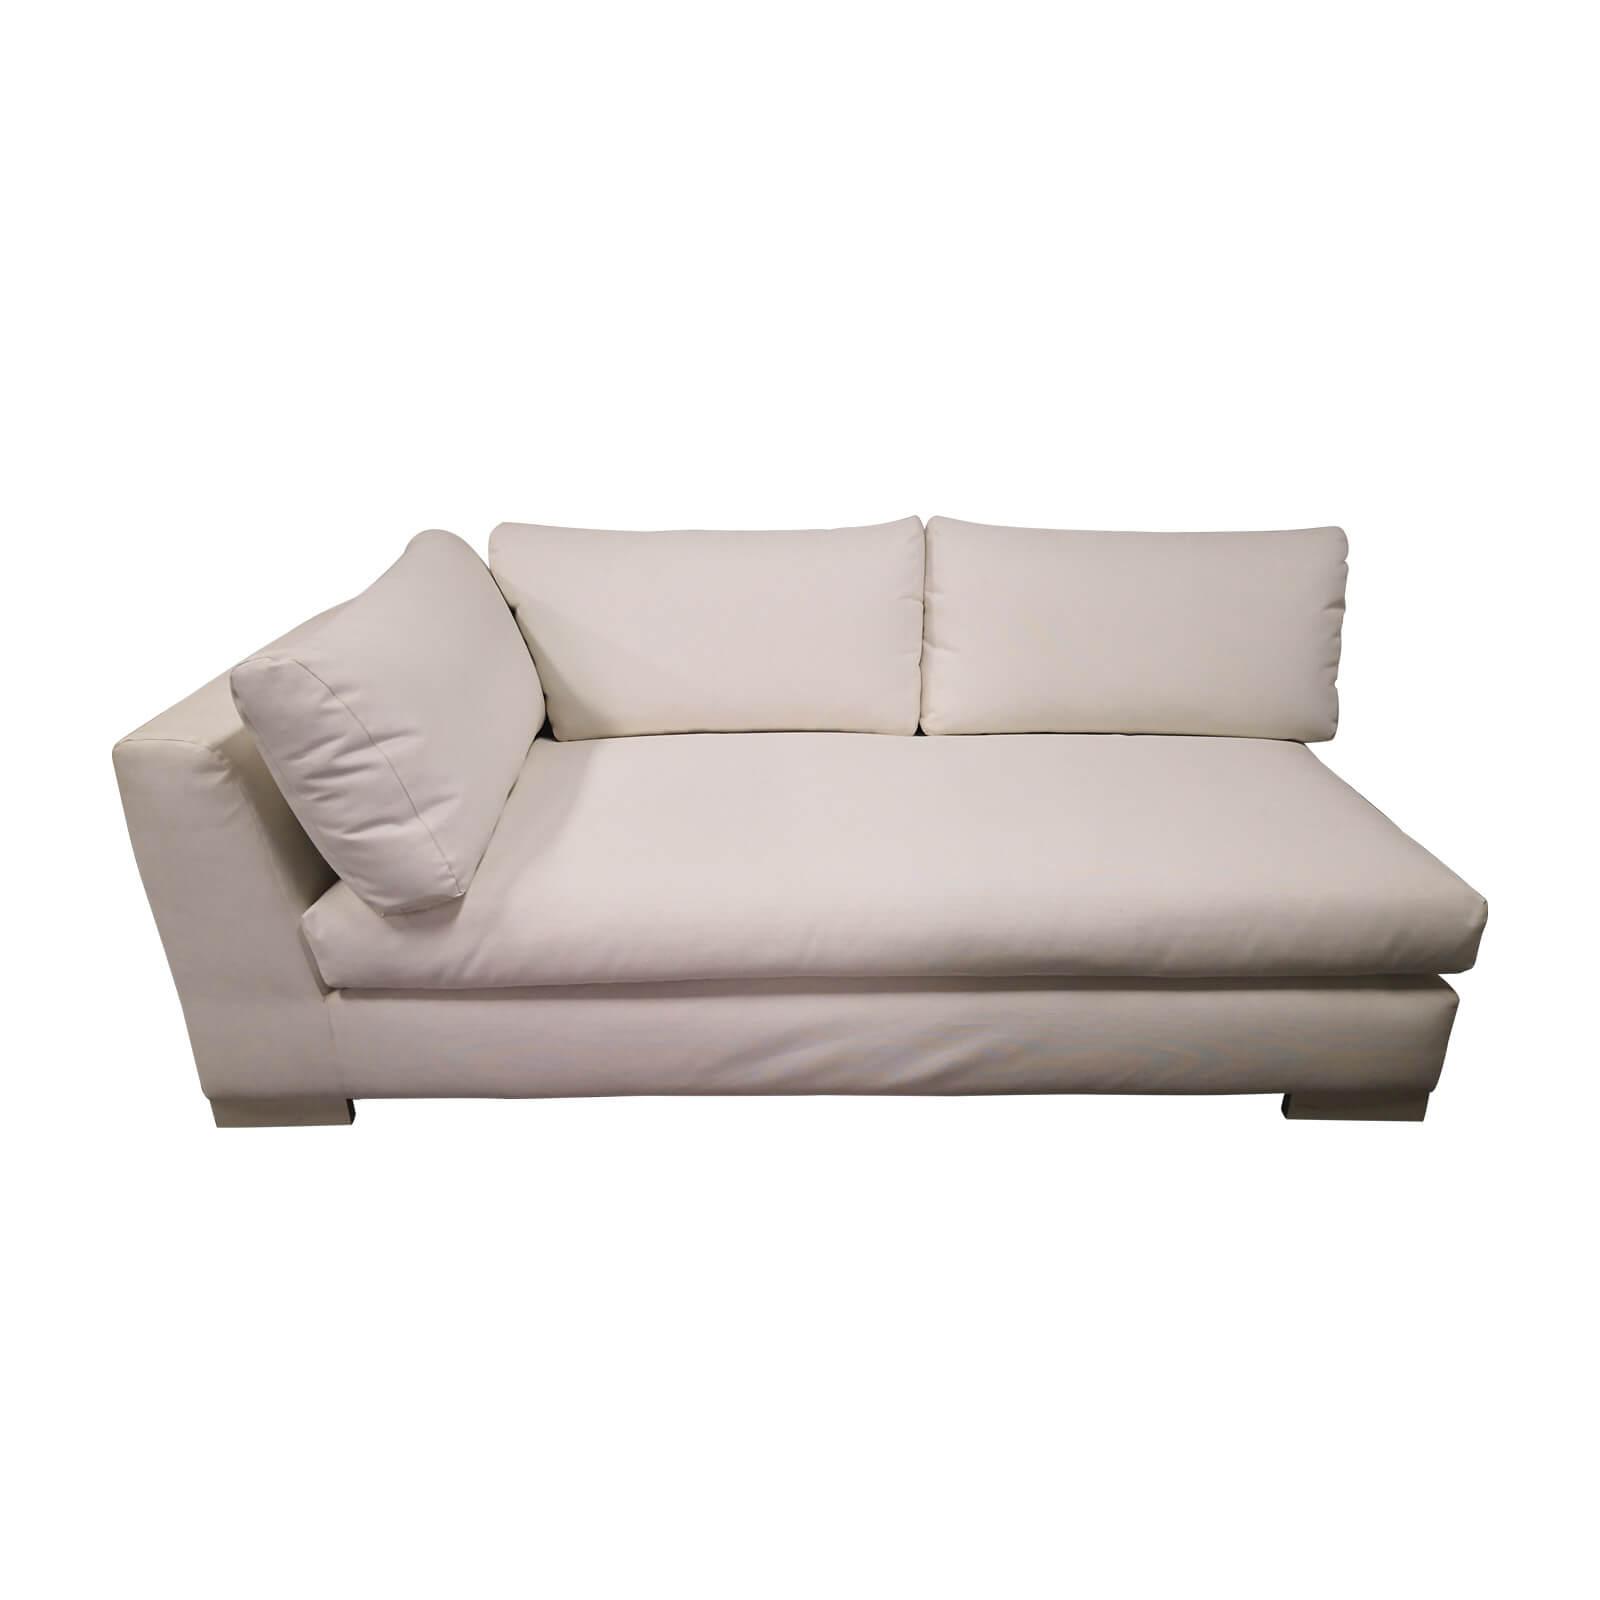 Two Design Lovers Outdoor furniture Osier Belle Leisuretex white sofa